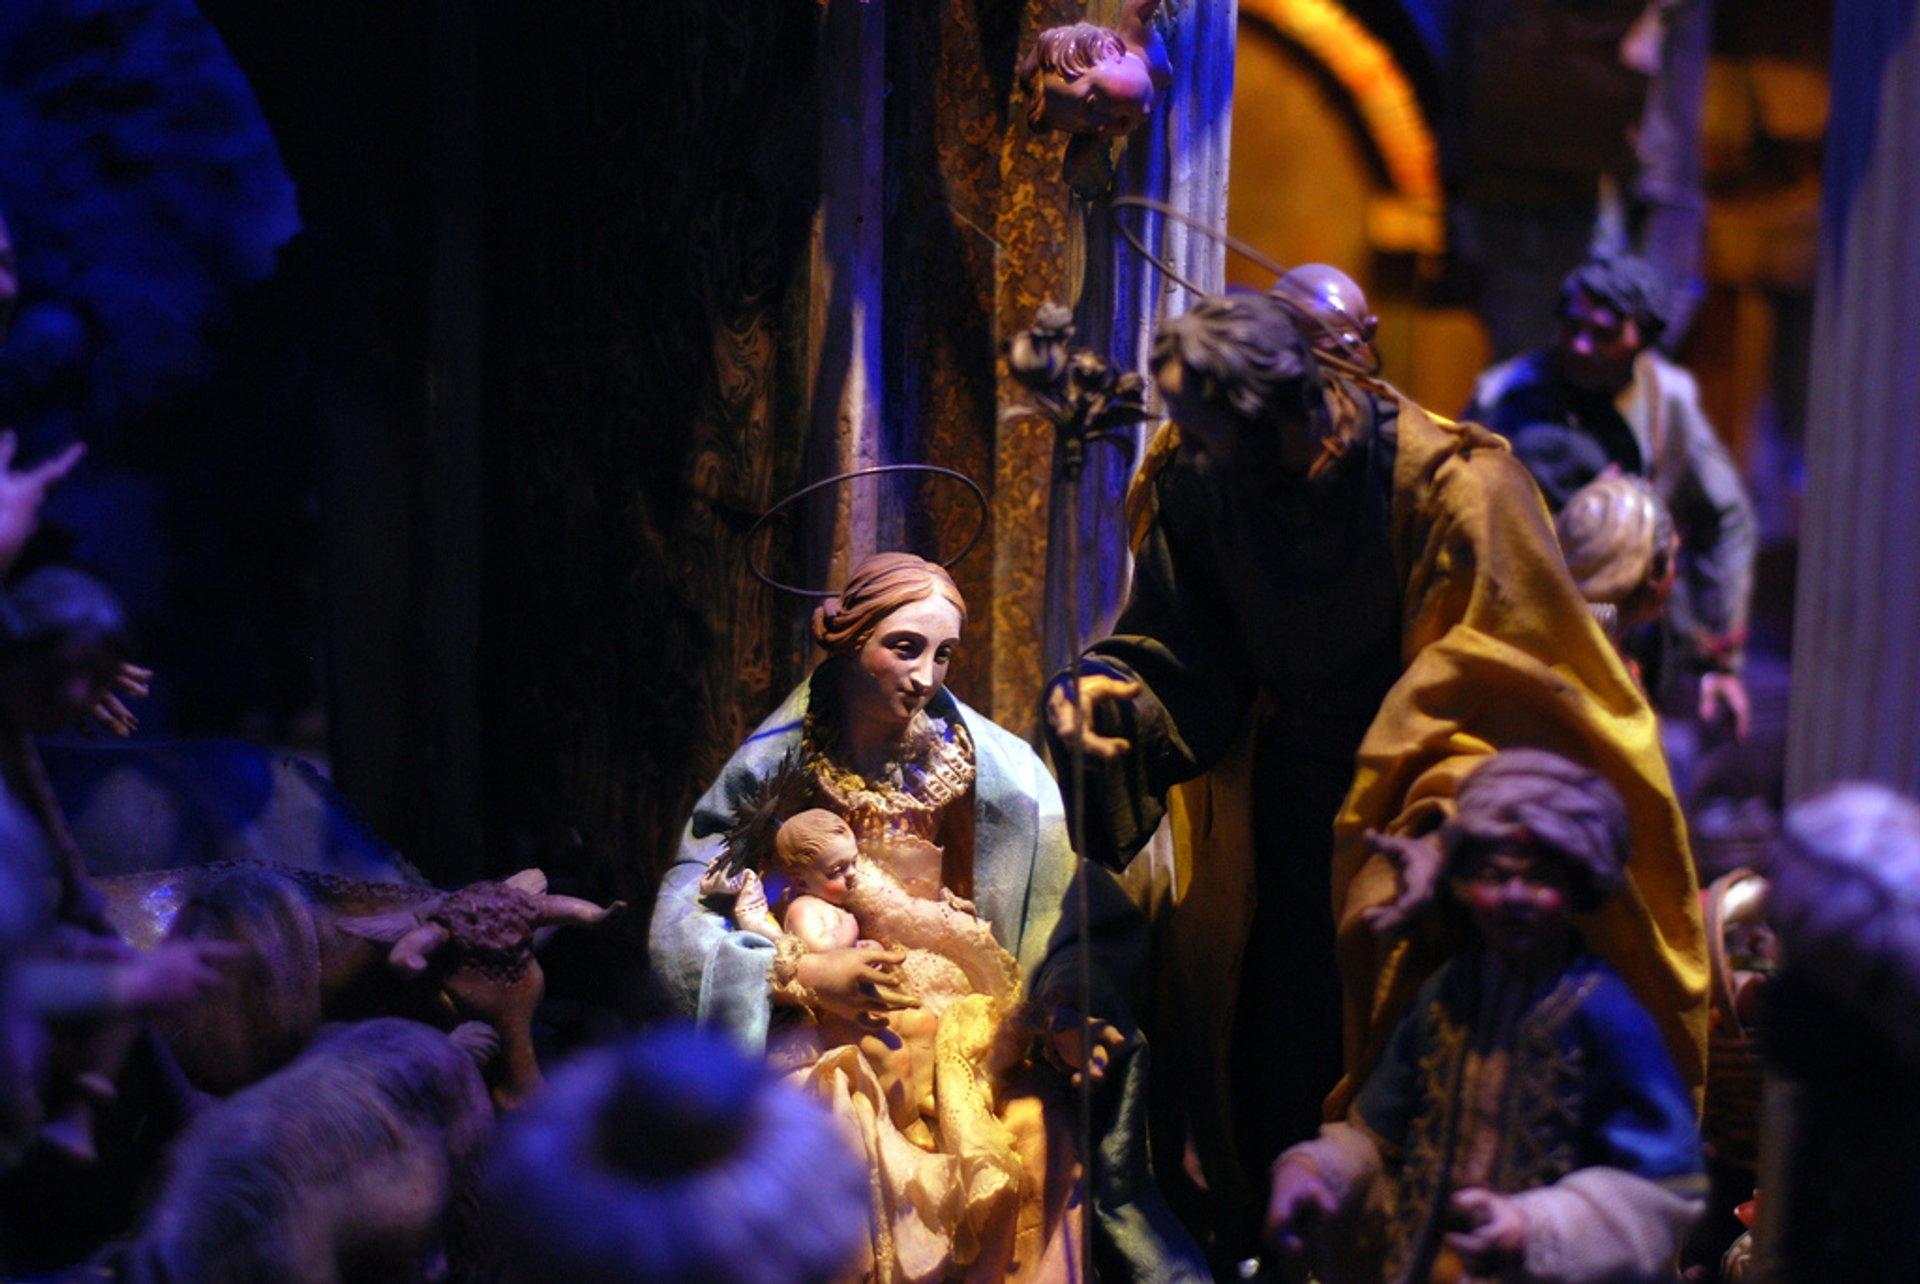 Presepe (nativity scene). Chiesa Madonna del Pozzo, Rome (Santa Maria in Via) 2020